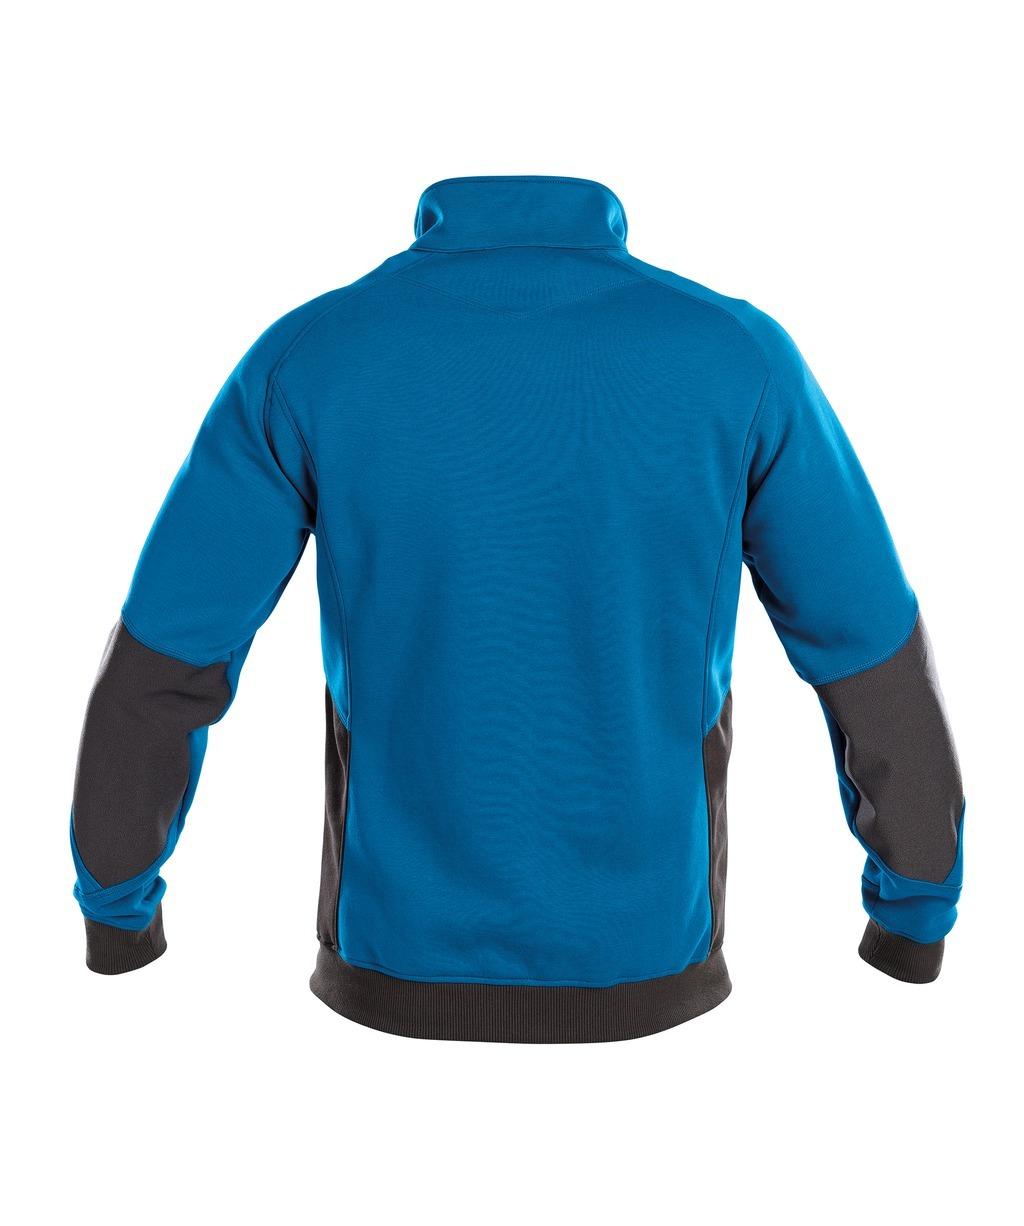 VELOX Sweater